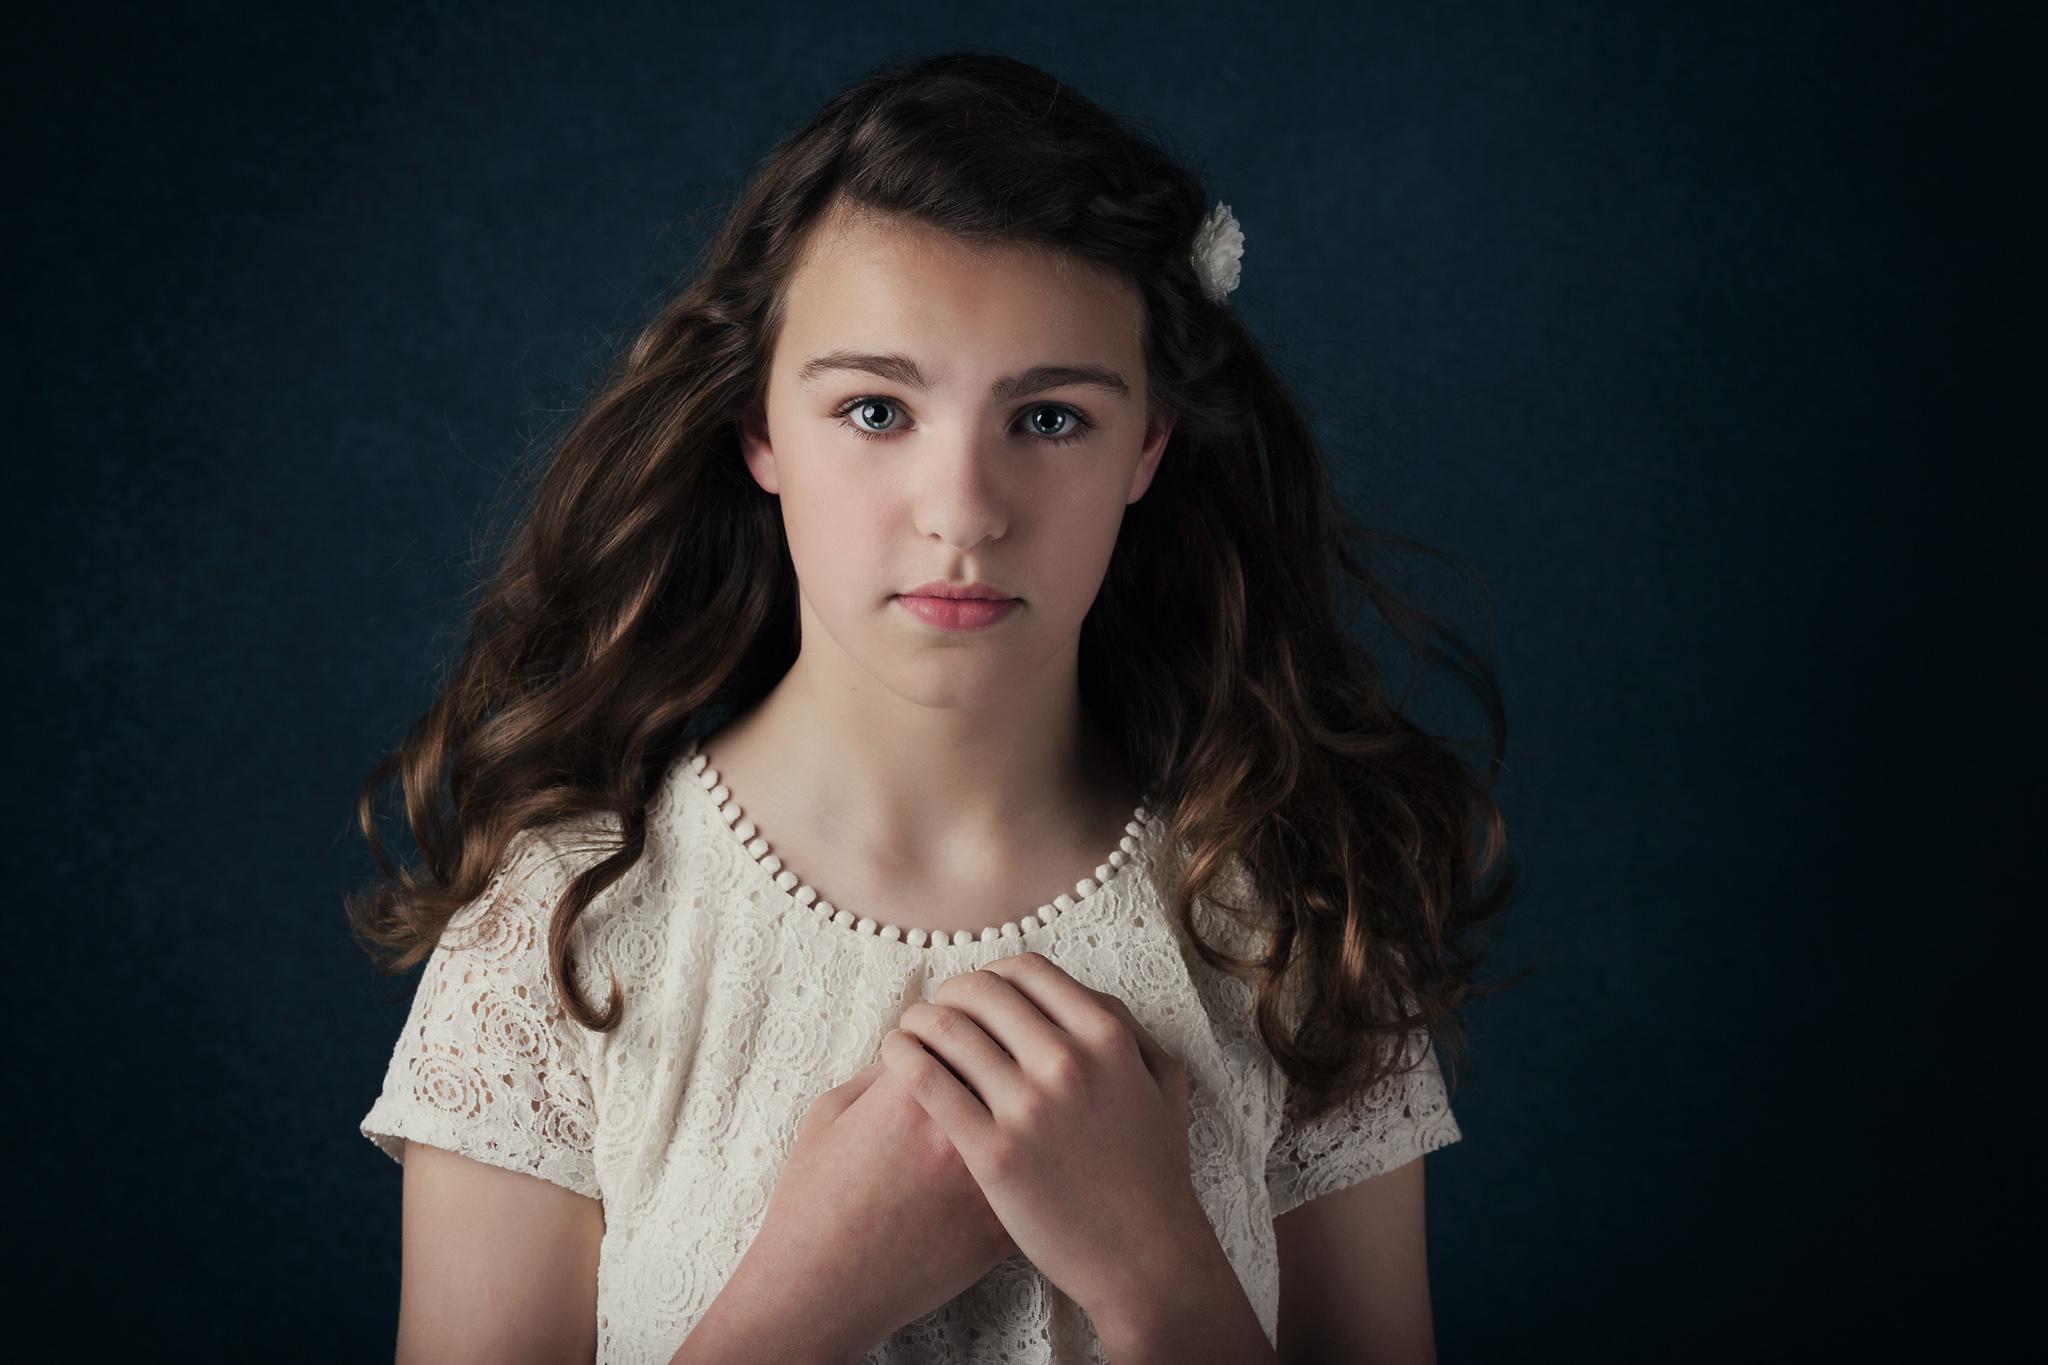 Iona fine art portrait